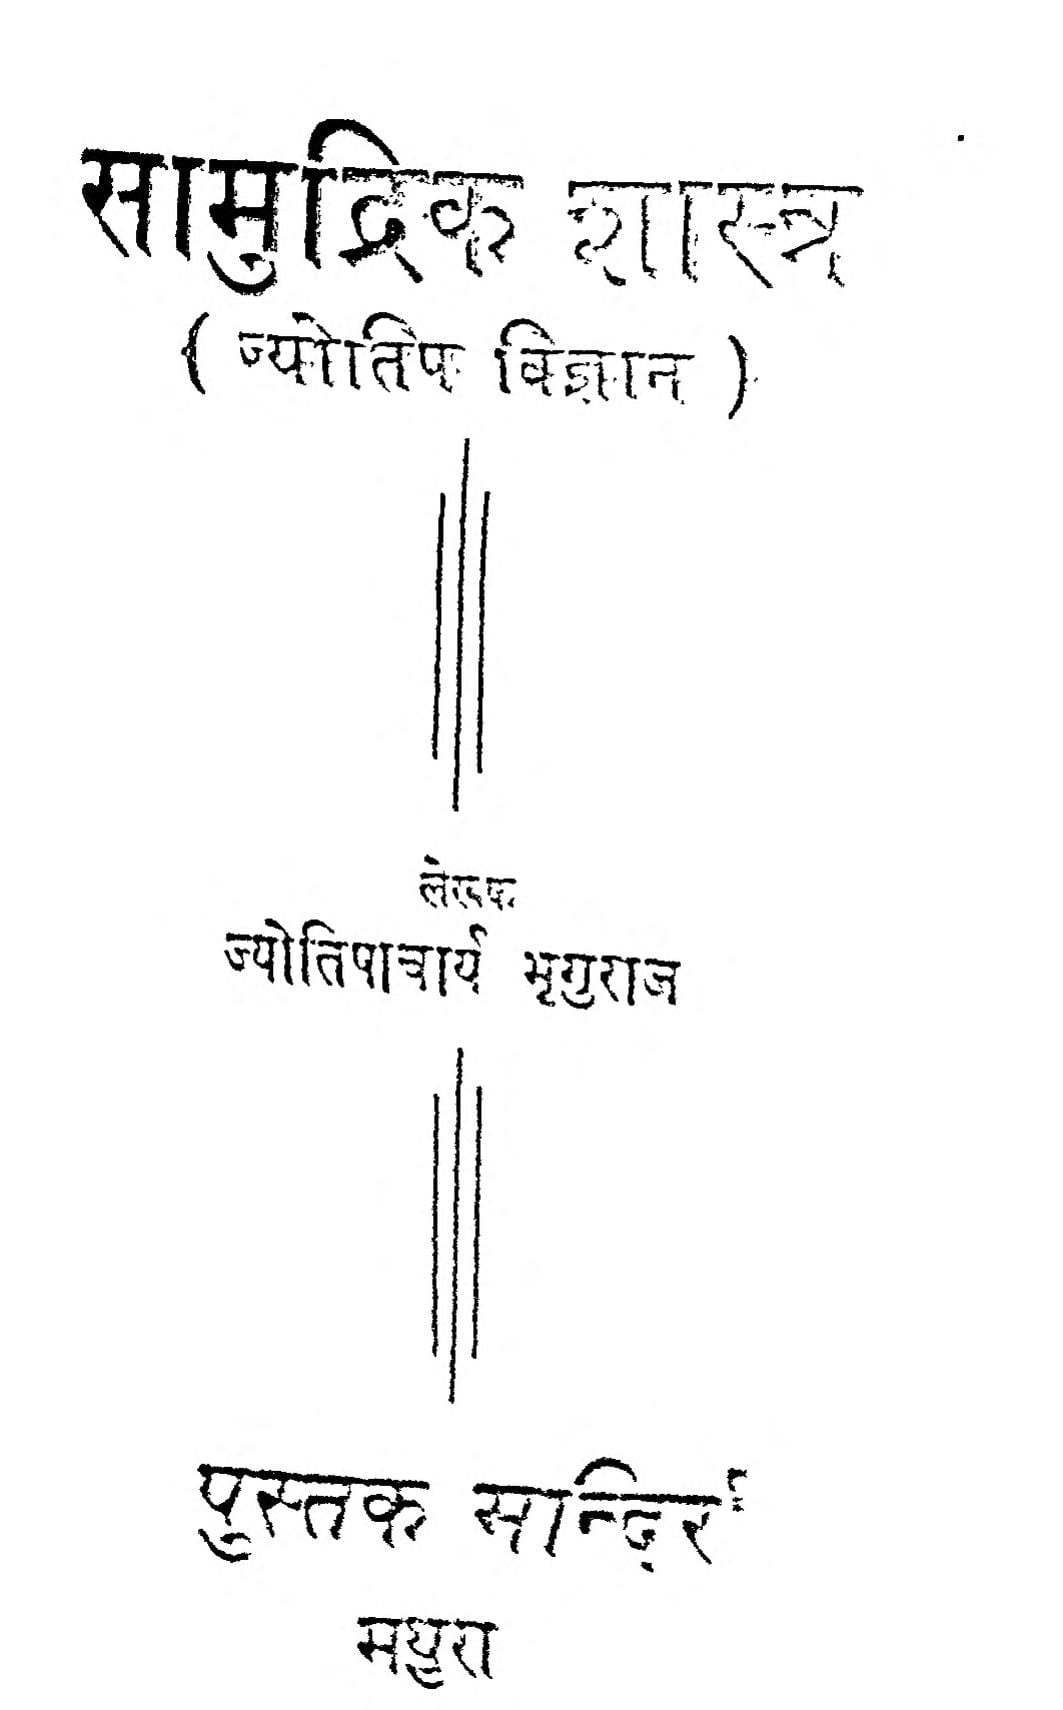 Samudirk Shastra by ज्योतिषाचार्य भृगुराज - Jyotishacharya Bhraguraj